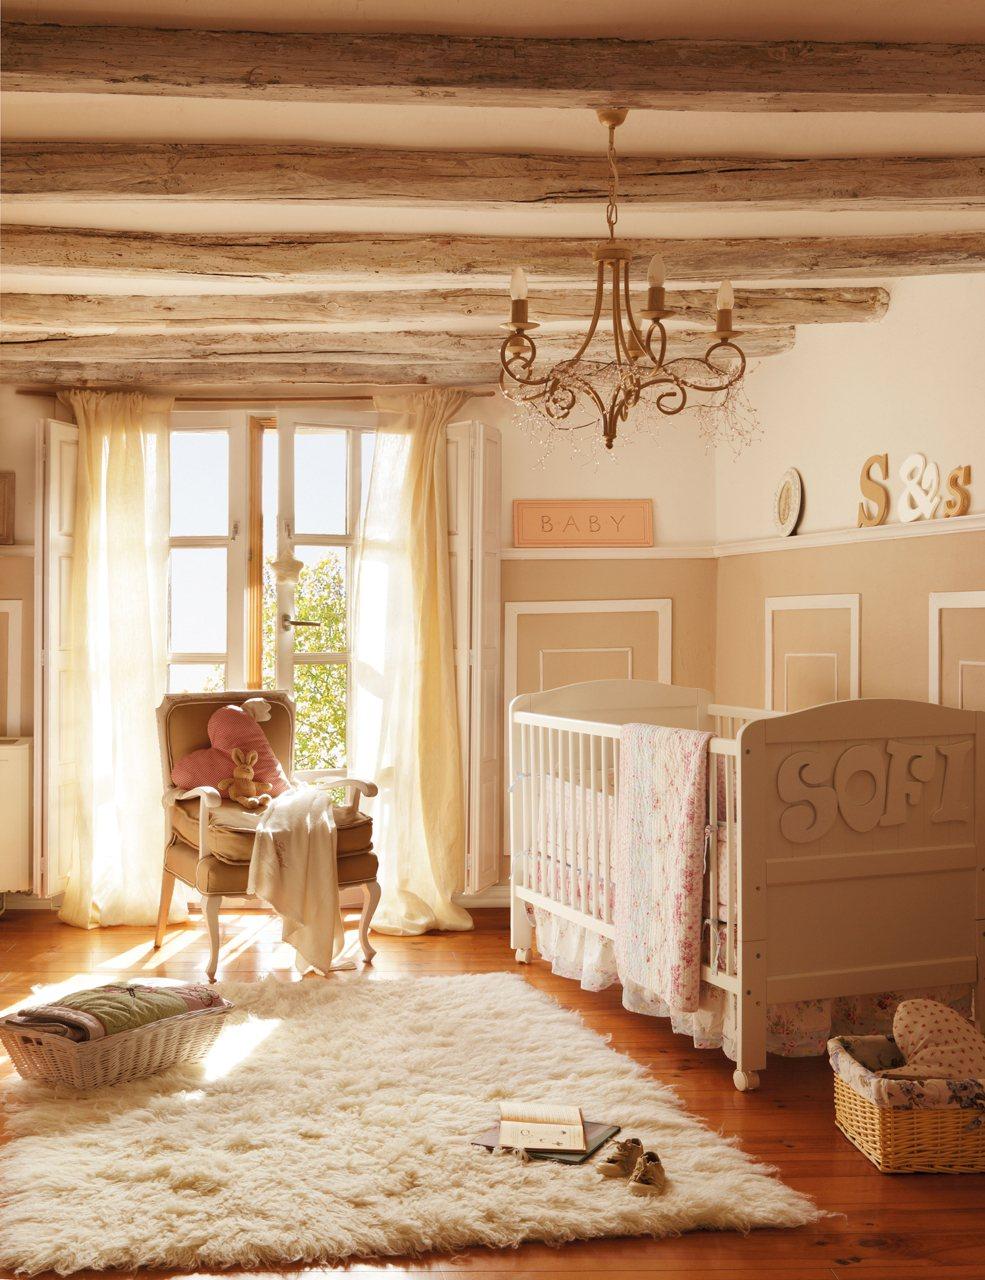 Детская комната с балками в стиле прованс